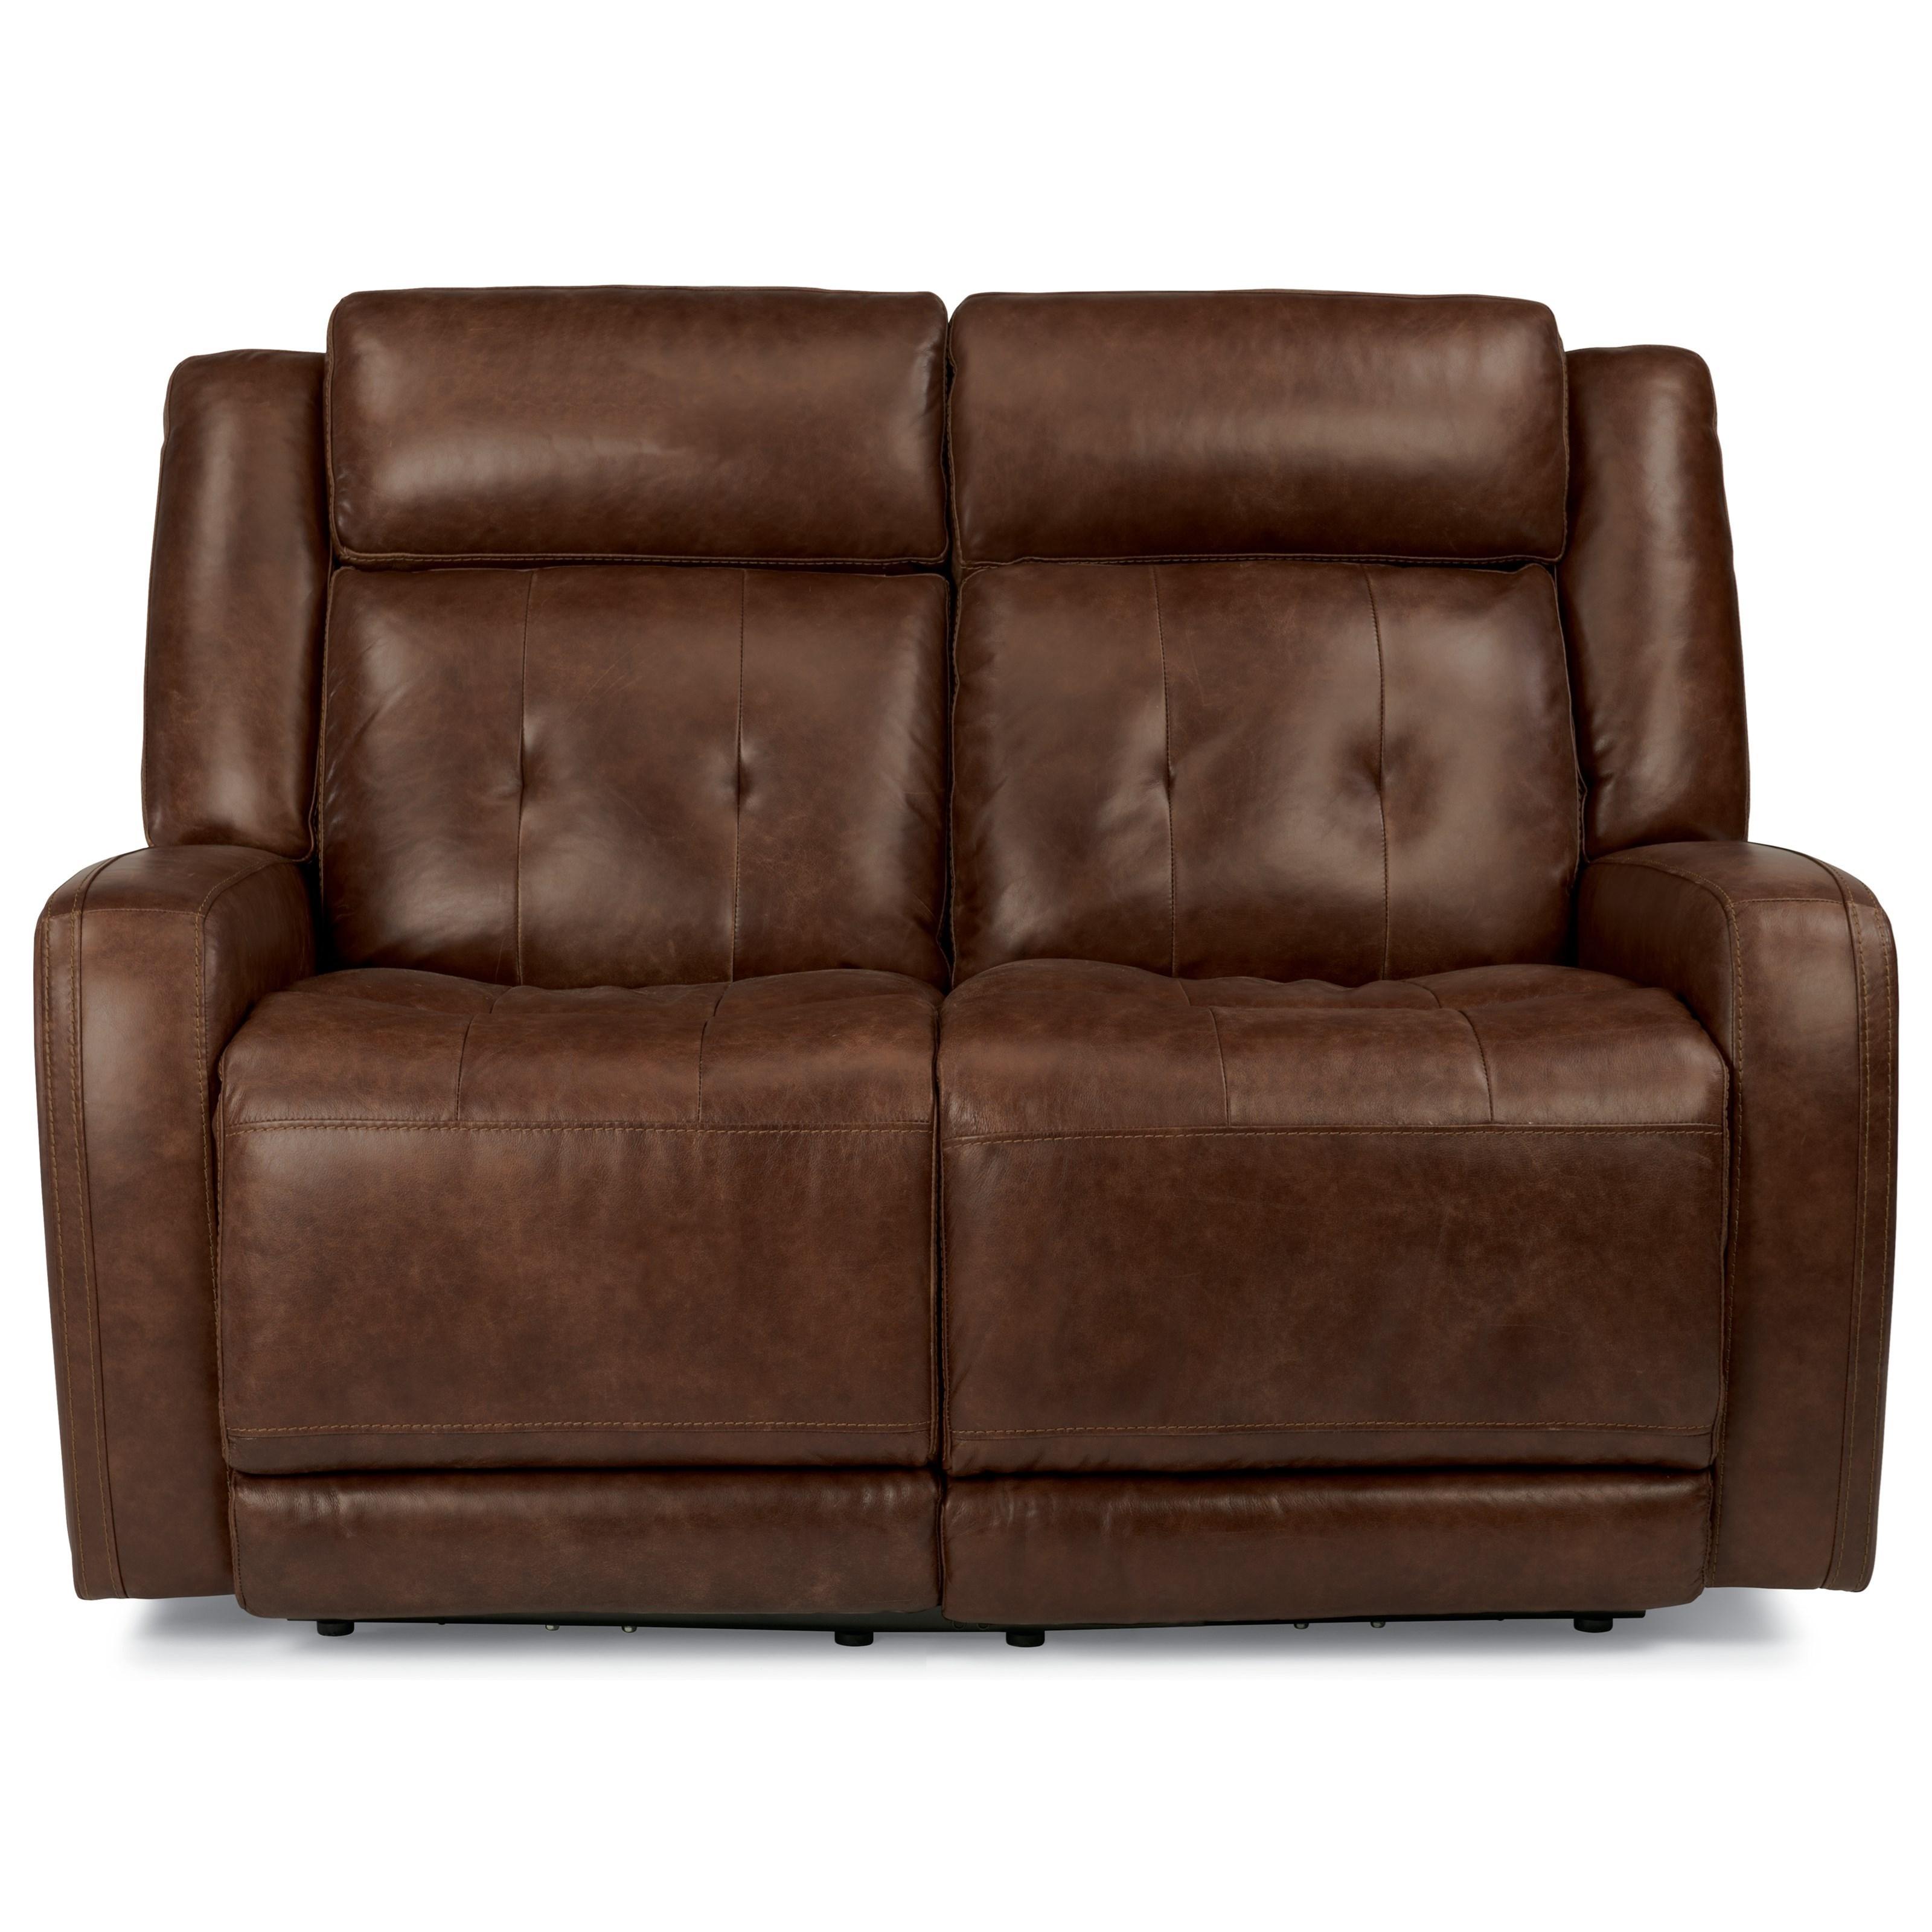 Flexsteel Latitudes-Jude Power Reclining Love Seat - Item Number: 1559-60PH